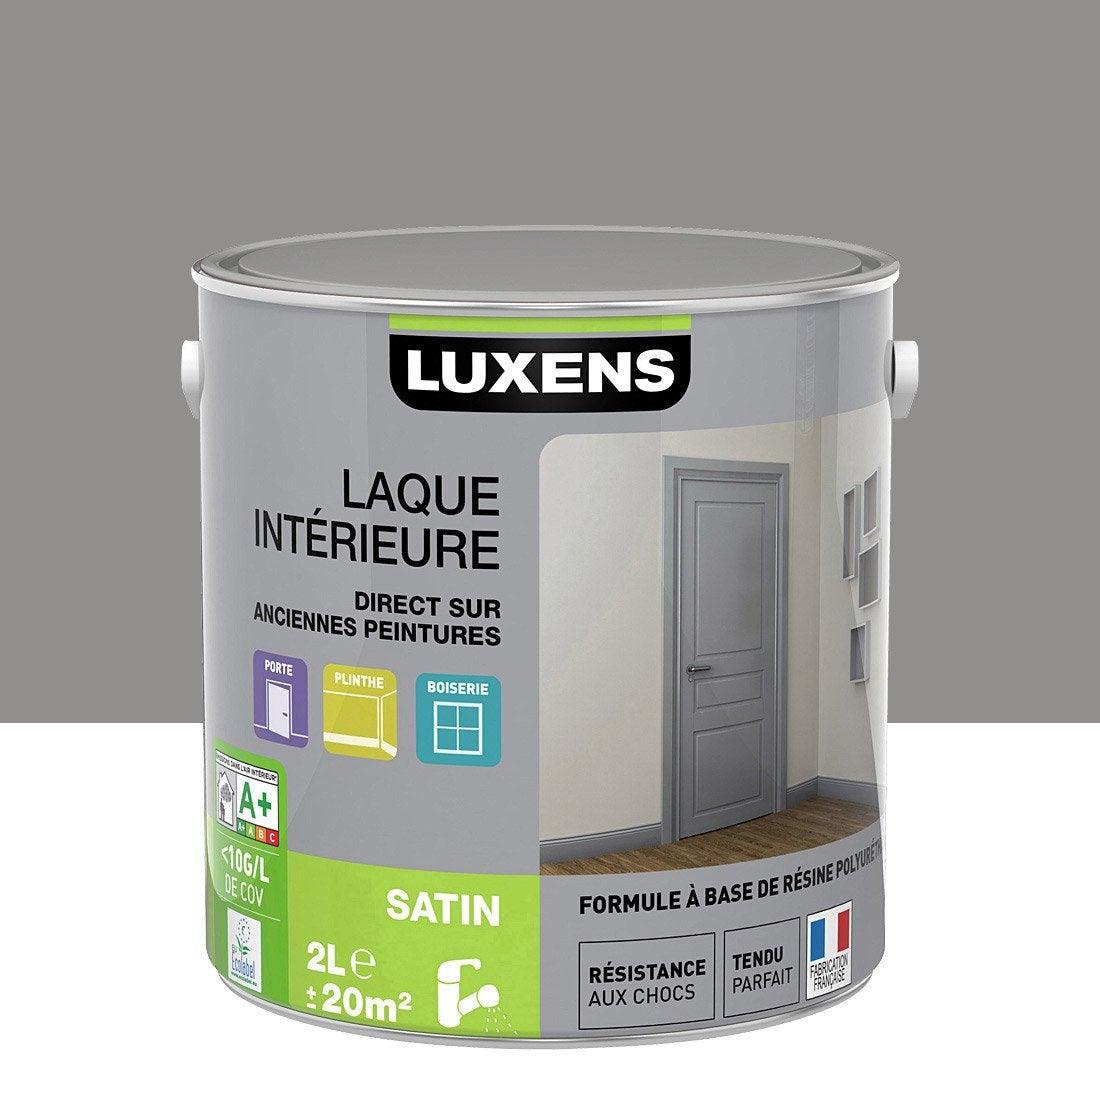 Peinture gris galet 3 luxens laque satin 2 l leroy merlin - Peinture isolante leroy merlin ...